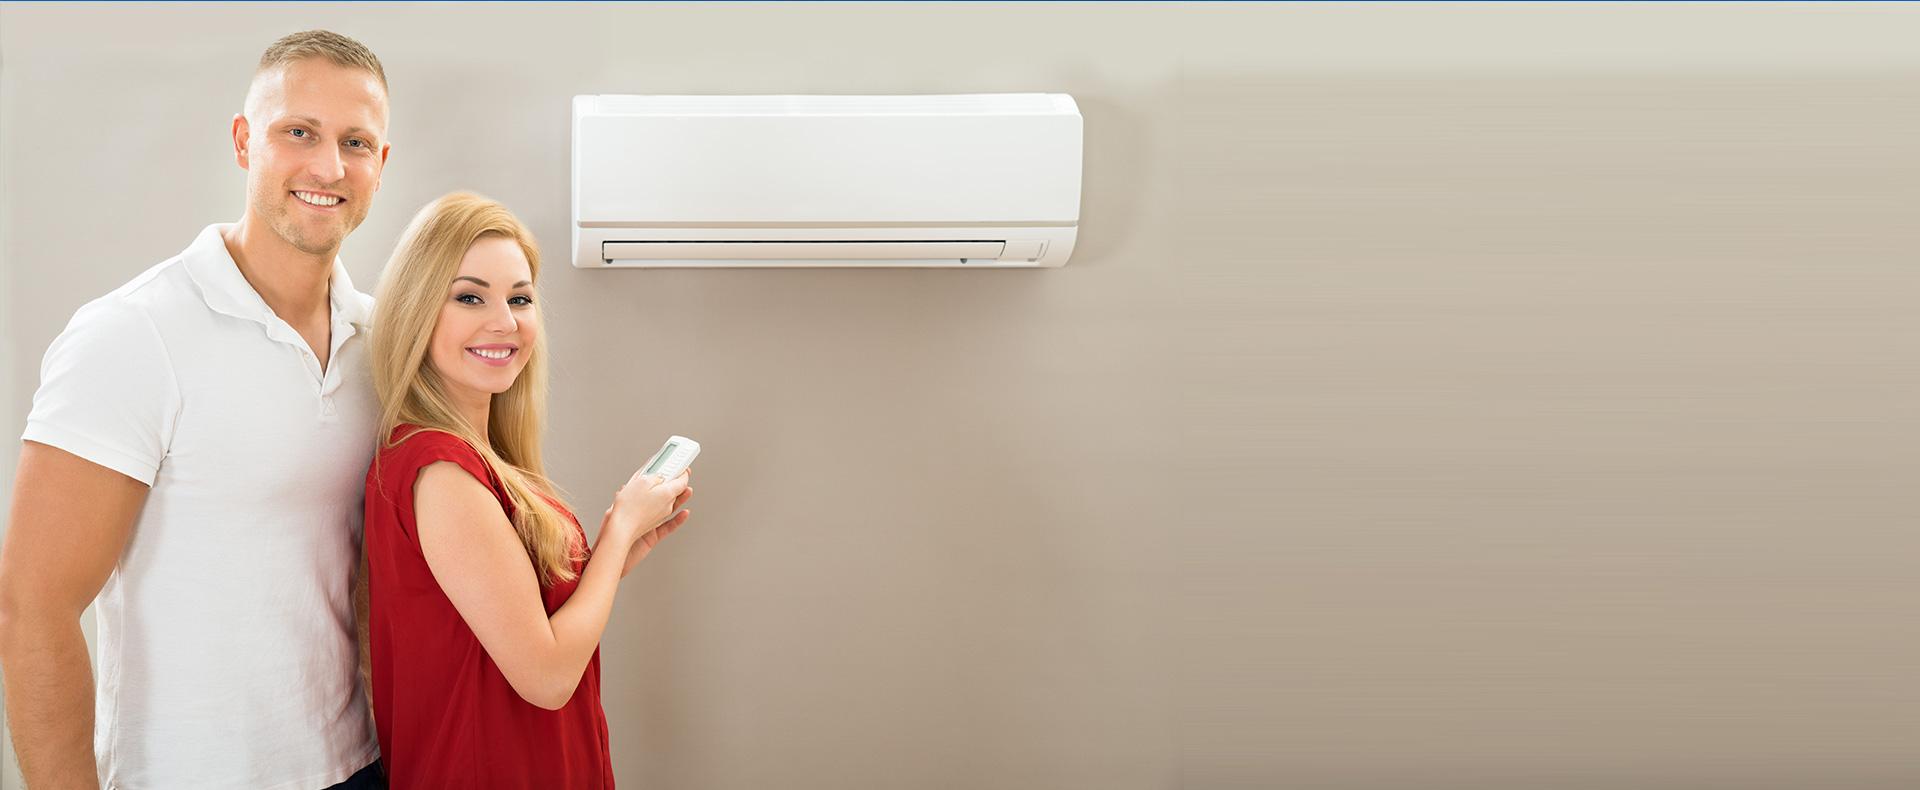 Kundenfeedback Kälte- und Klimatechnik Kruse